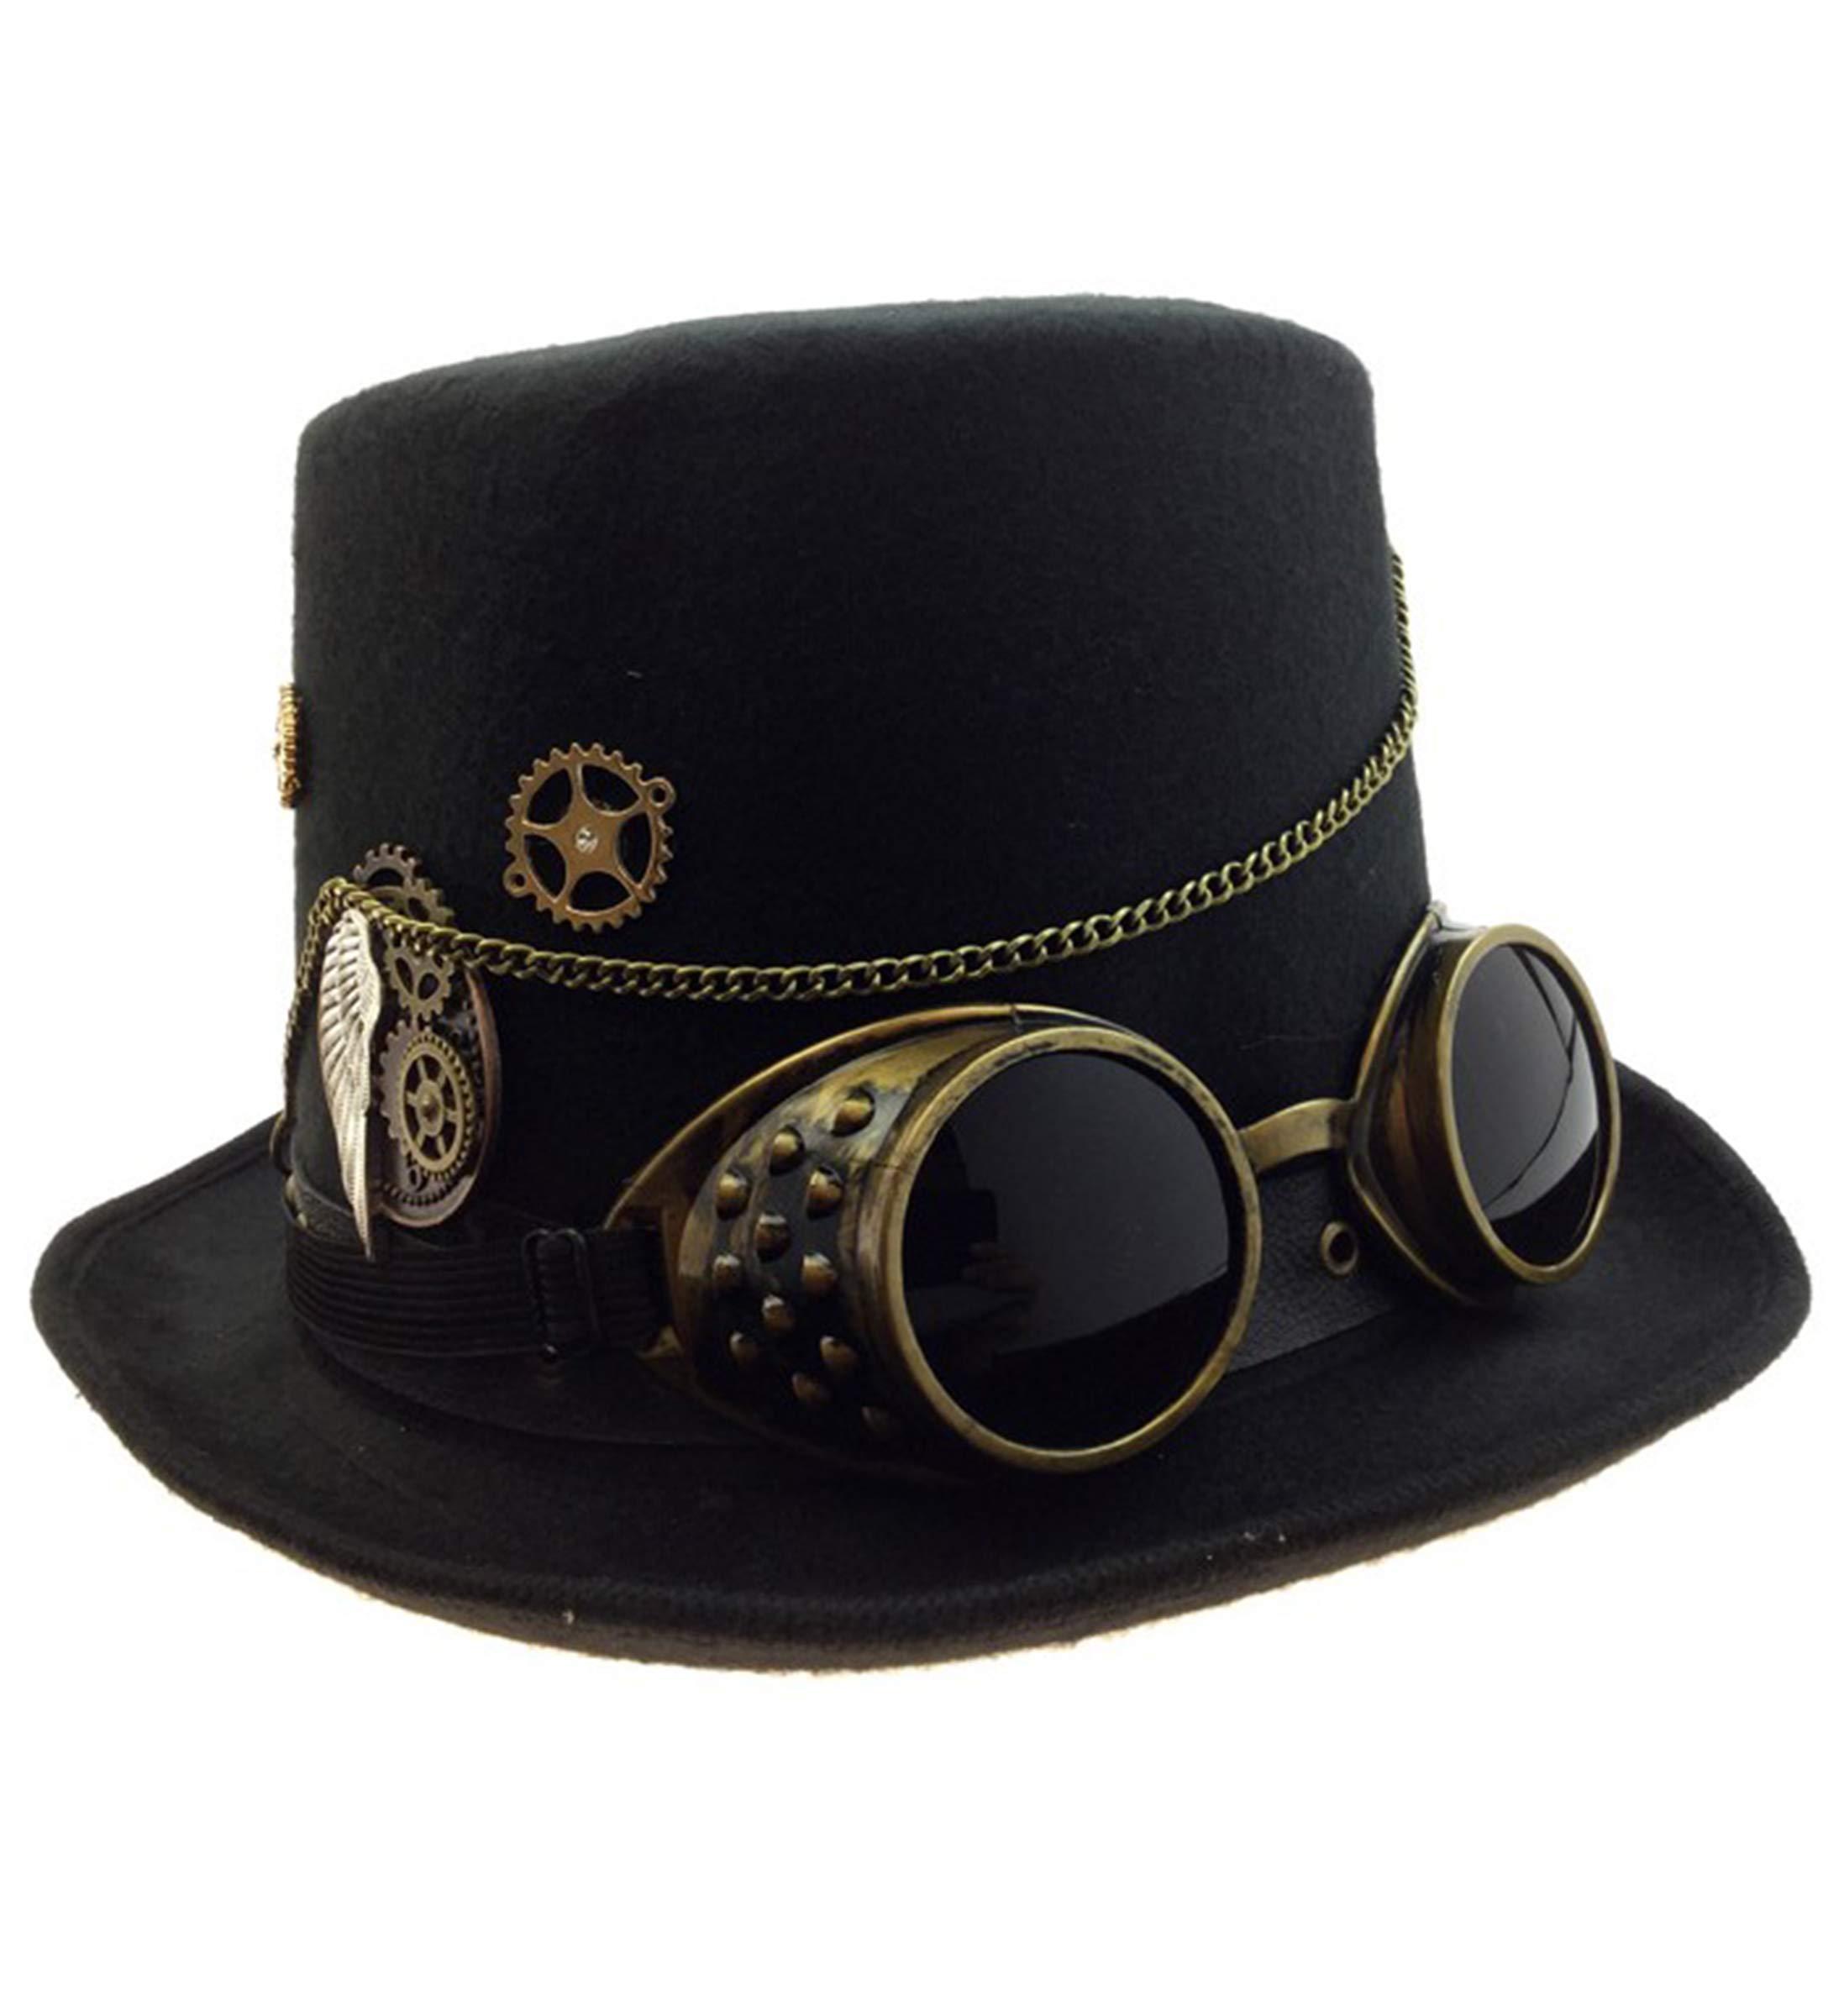 KBW Adult Unisex Steampunk Gold Deluxe Fabric Top Hat, Vintage Victorian Punk Rustic Gothic Motorcycle Pilot Aviator Eyewear Headgear